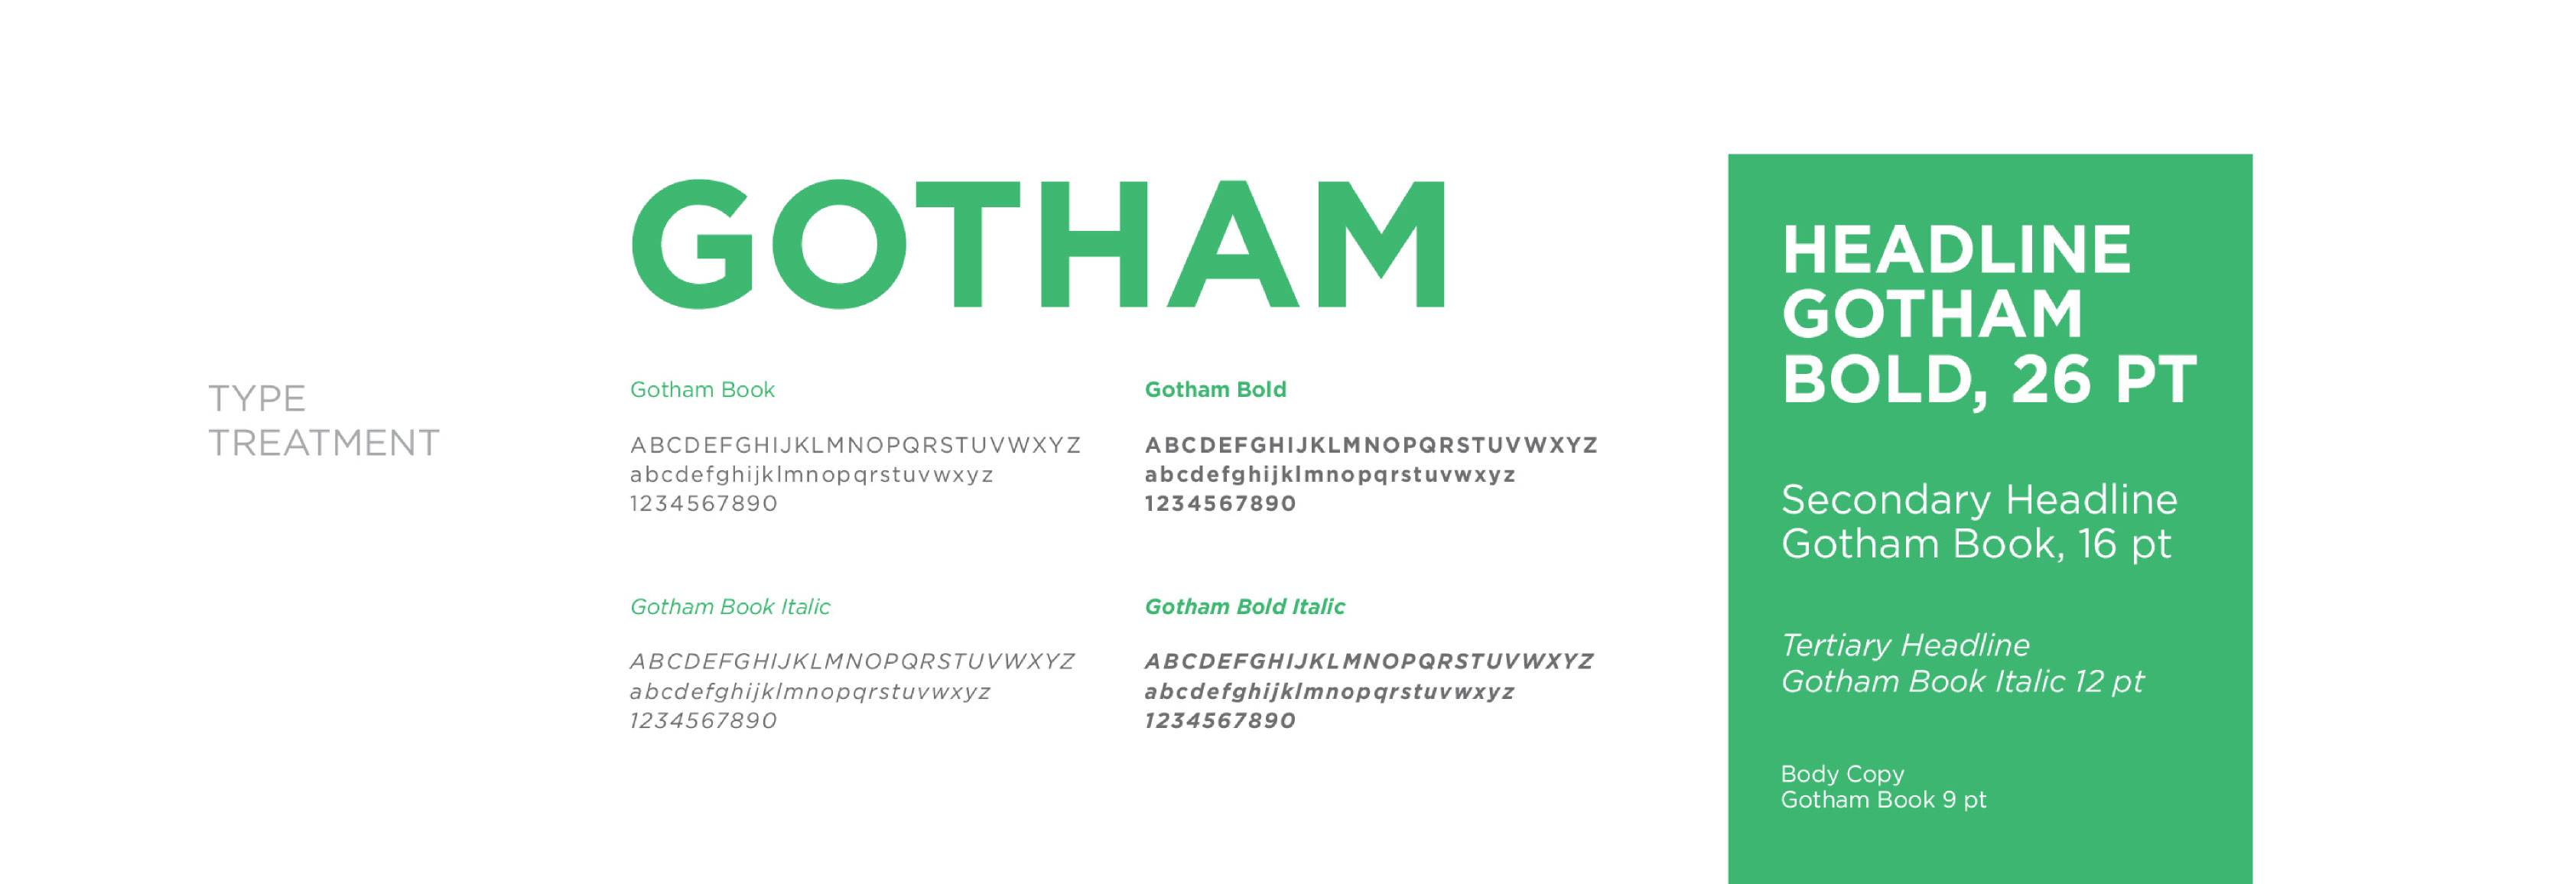 First national Bank font